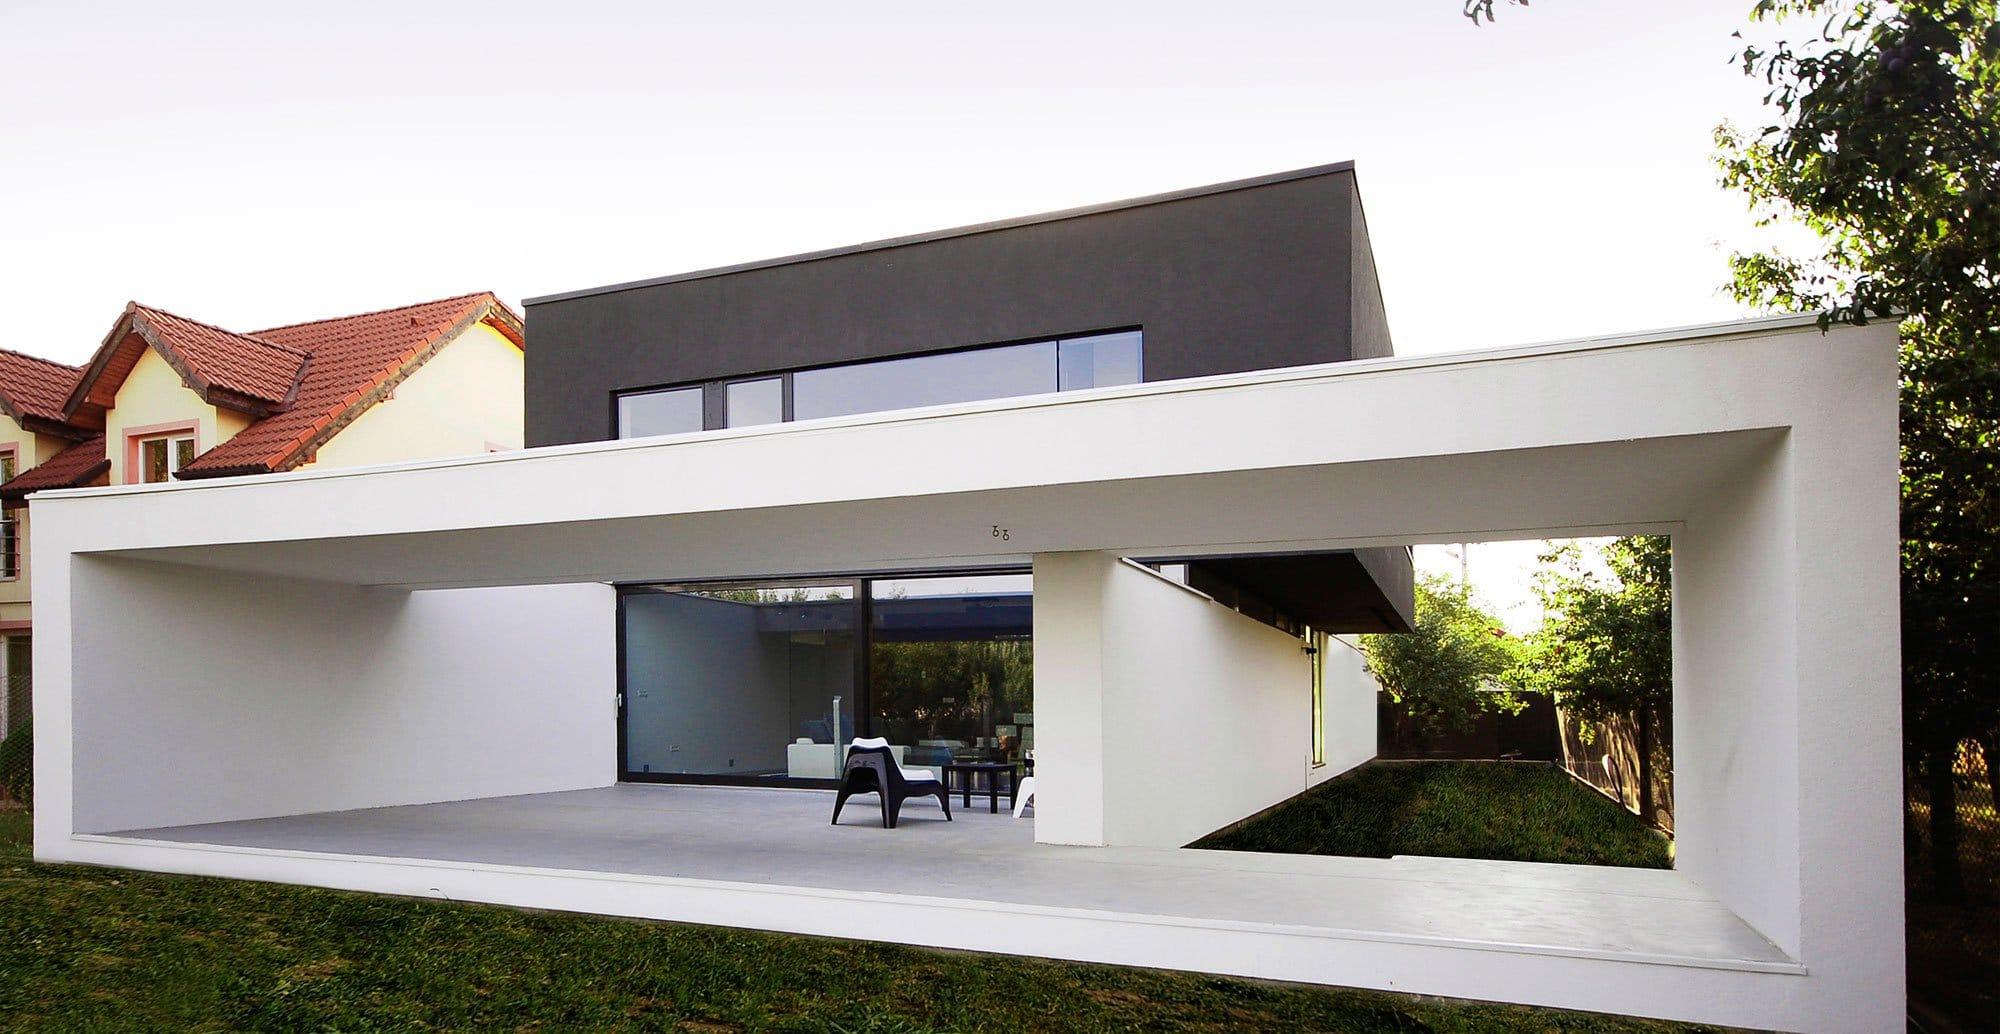 Dise o de casa moderna de dos plantas construye hogar for Plantas de viviendas modernas